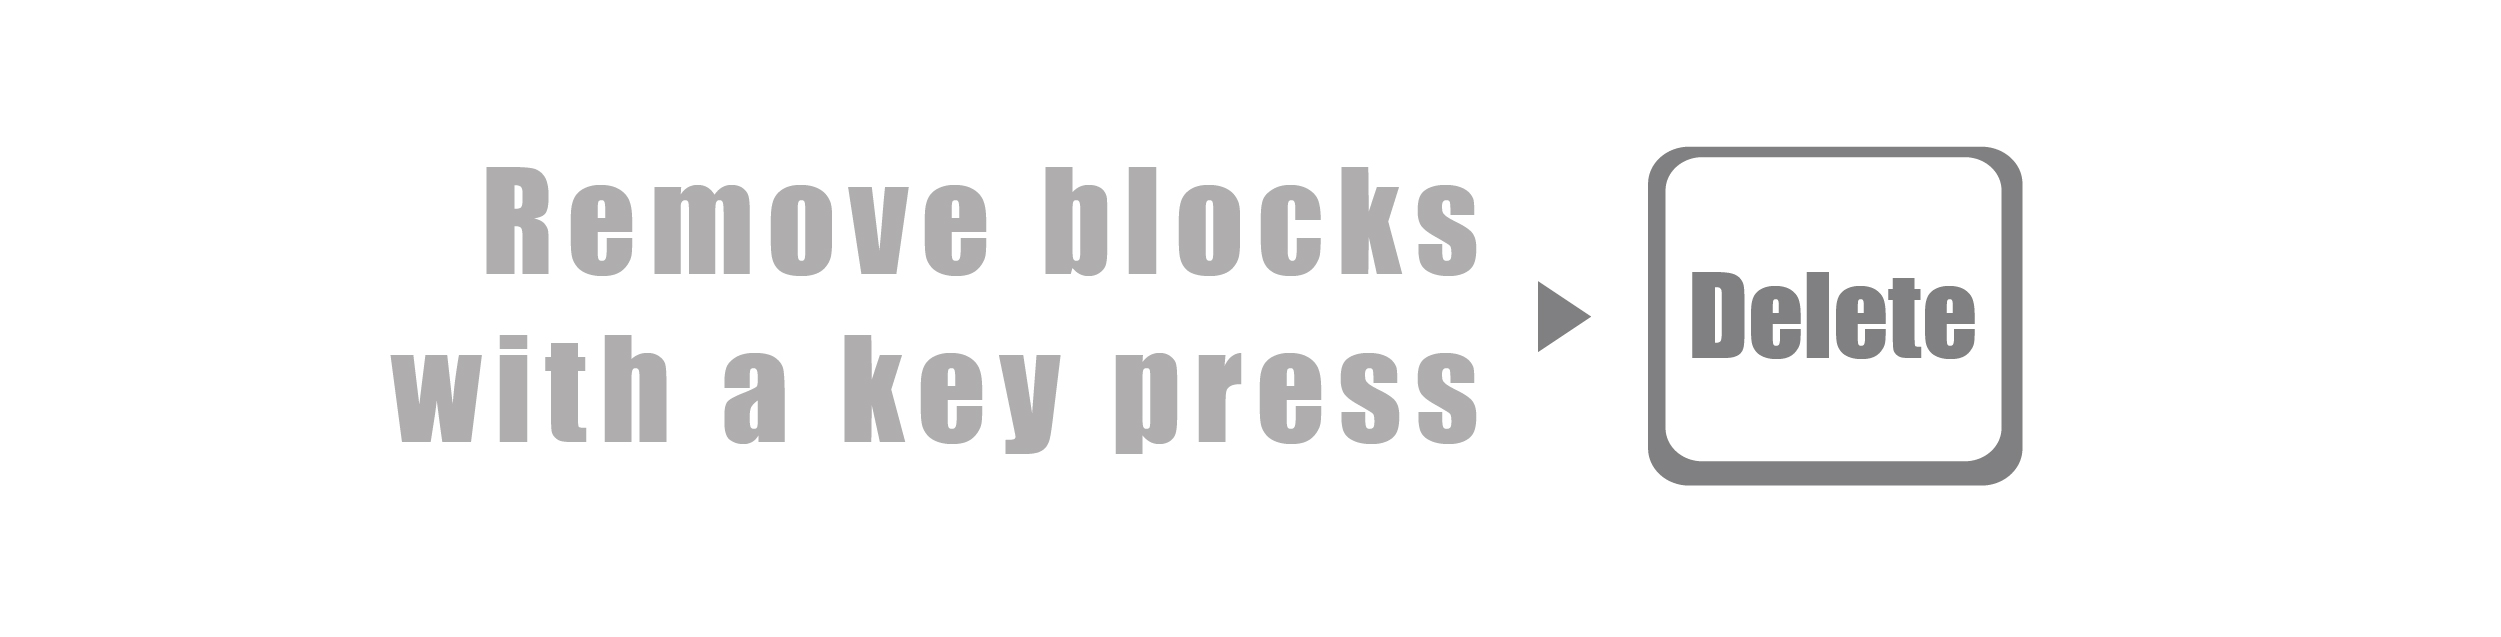 Easily Remove blocks